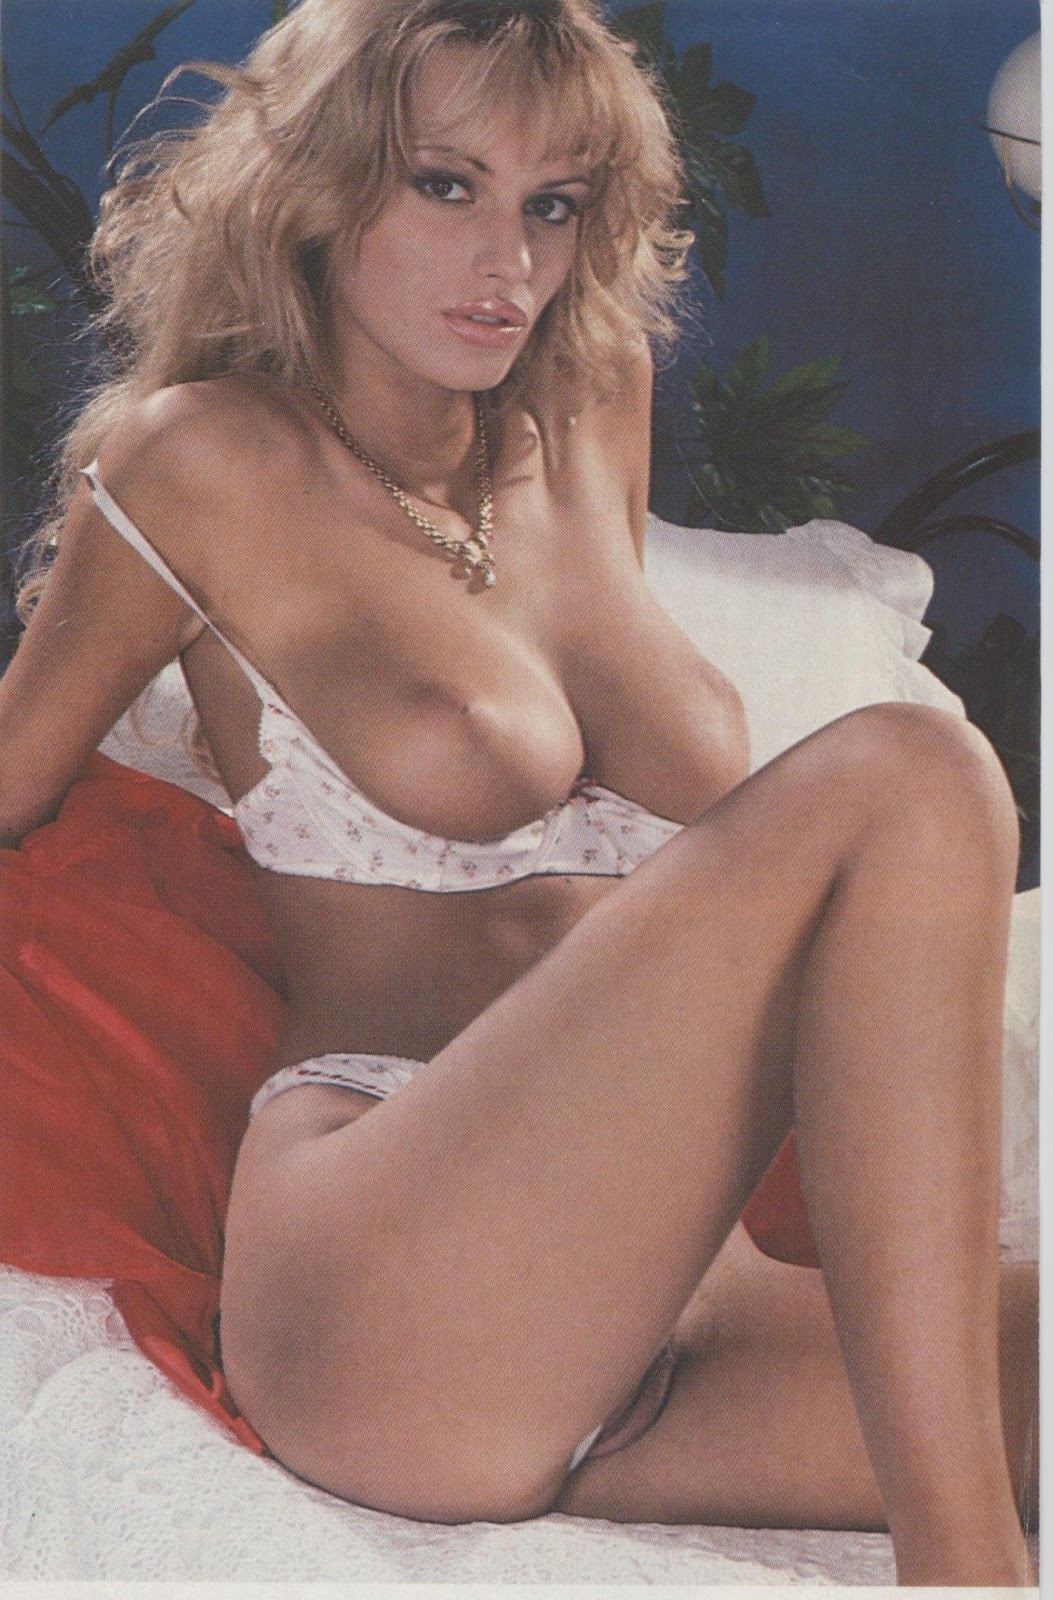 Anita is a blonde blowjob angel